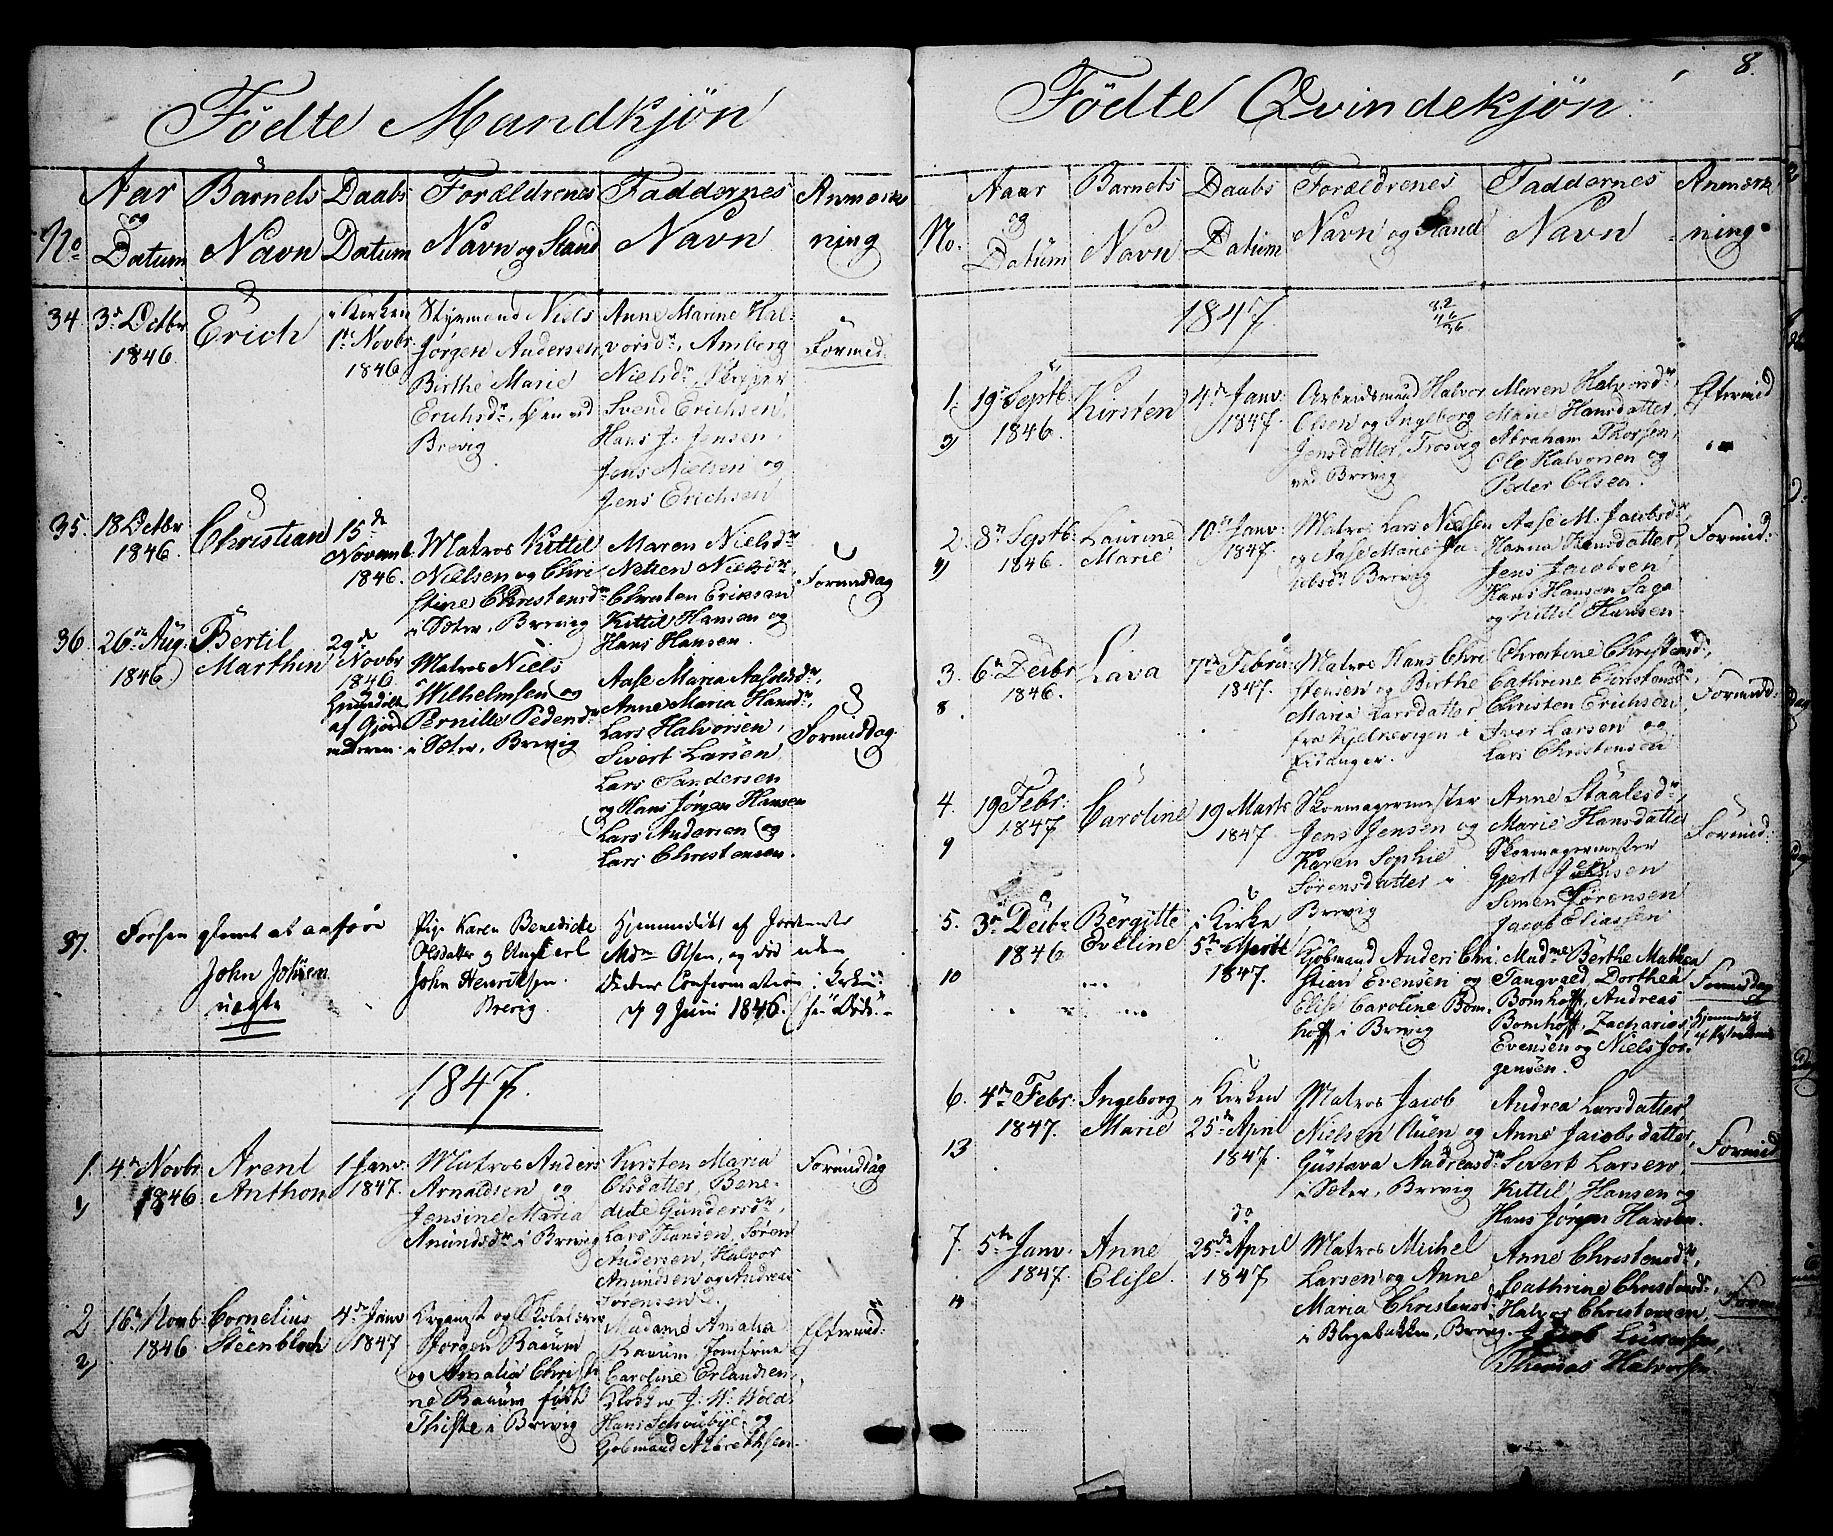 SAKO, Brevik kirkebøker, G/Ga/L0002: Klokkerbok nr. 2, 1846-1865, s. 8